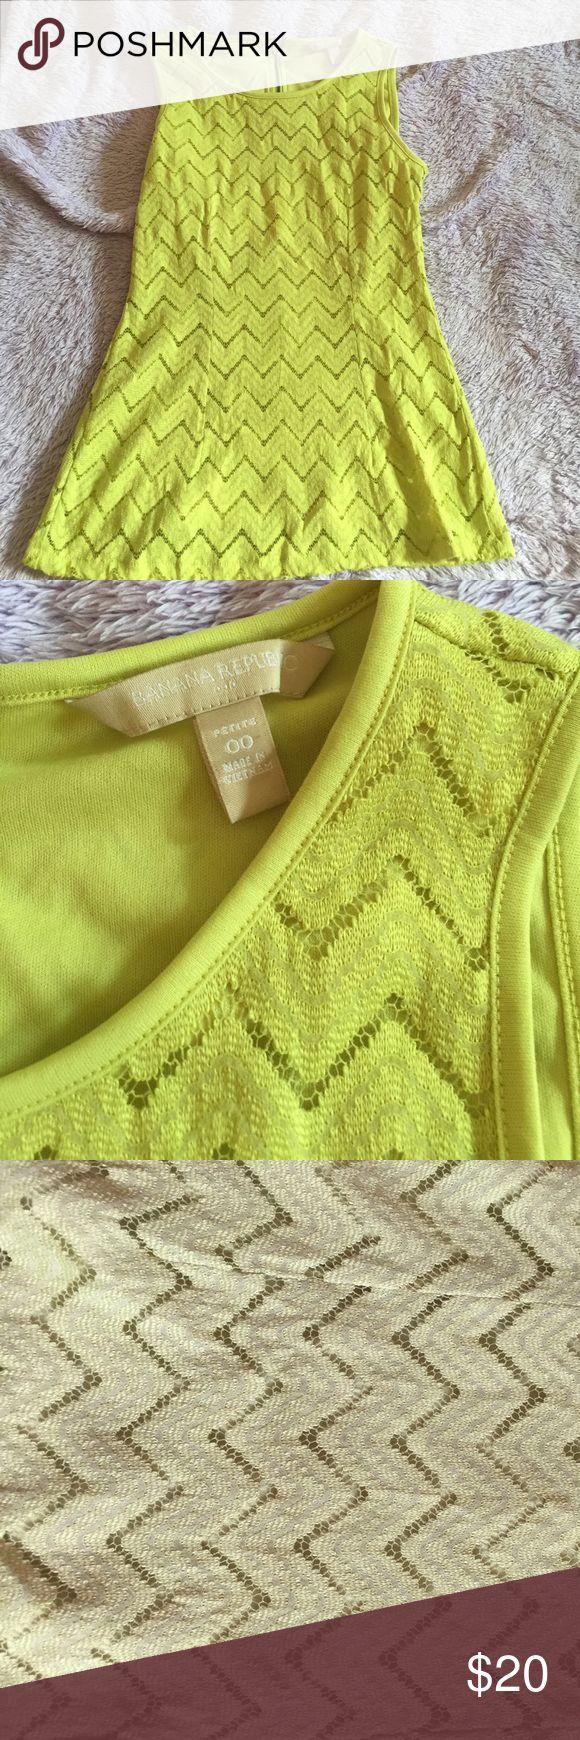 Banana Republic Shirt Green chevron design sleeveless. Zip closure. Banana Republic Tops Blouses